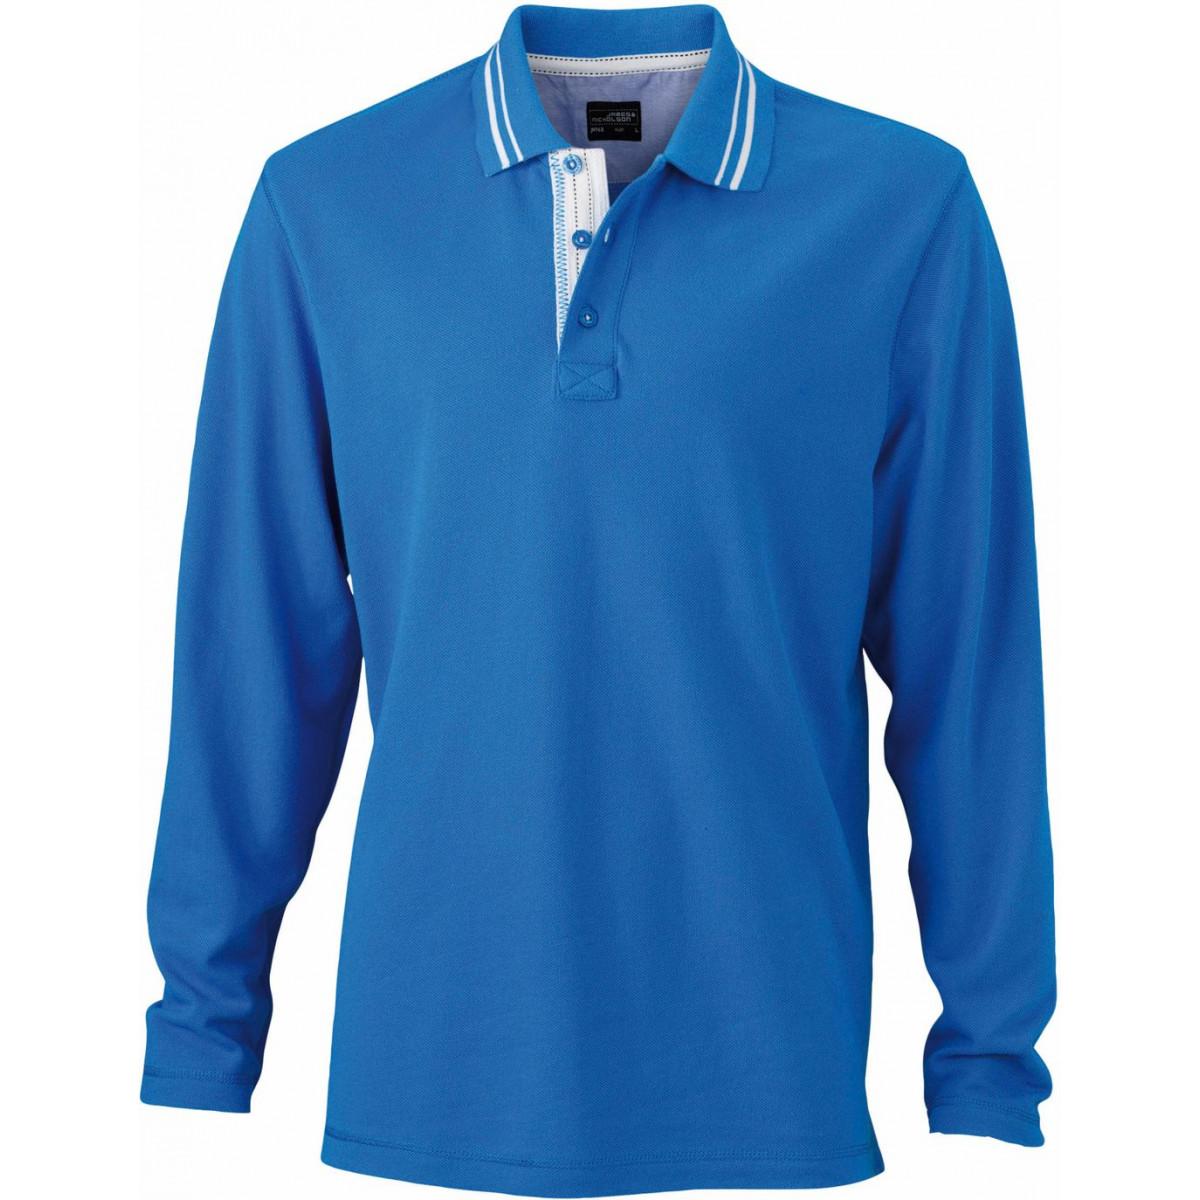 Рубашка поло мужская JN968 Mens Polo Long-Sleeved - Кобальт/Белый